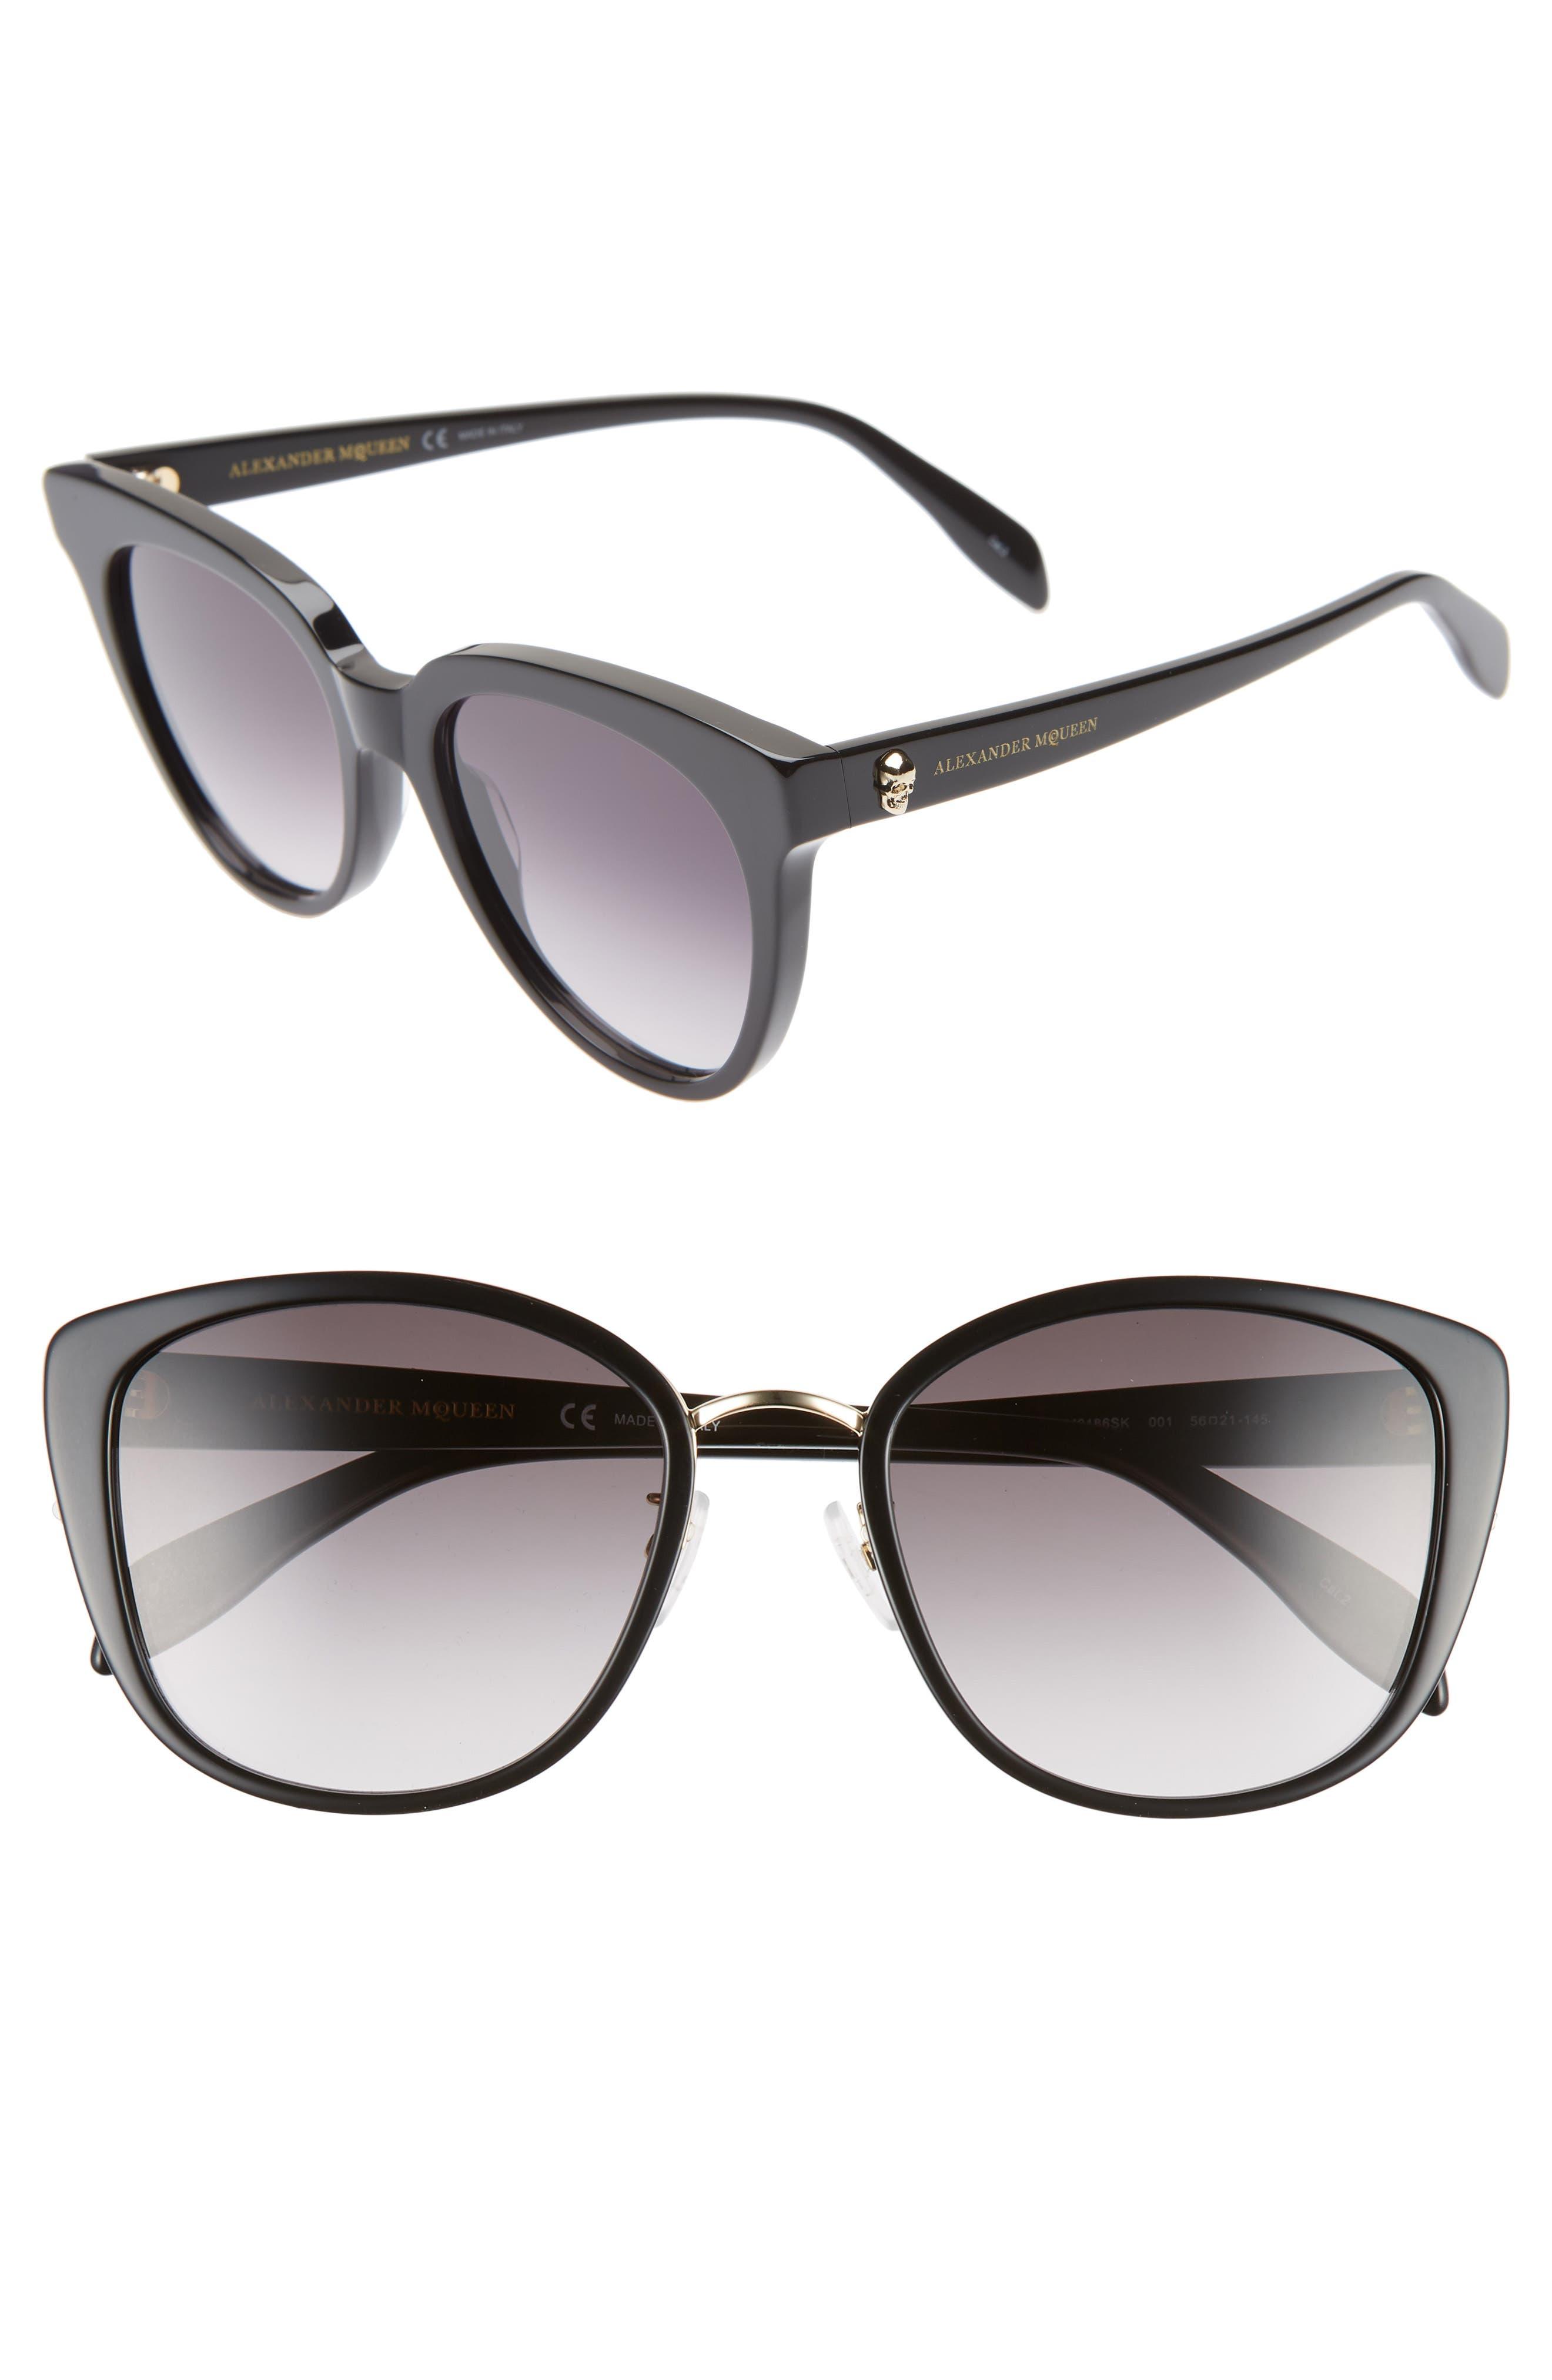 ALEXANDER MCQUEEN 56mm Gradient Round Sunglasses, Main, color, BLACK/ GOLD